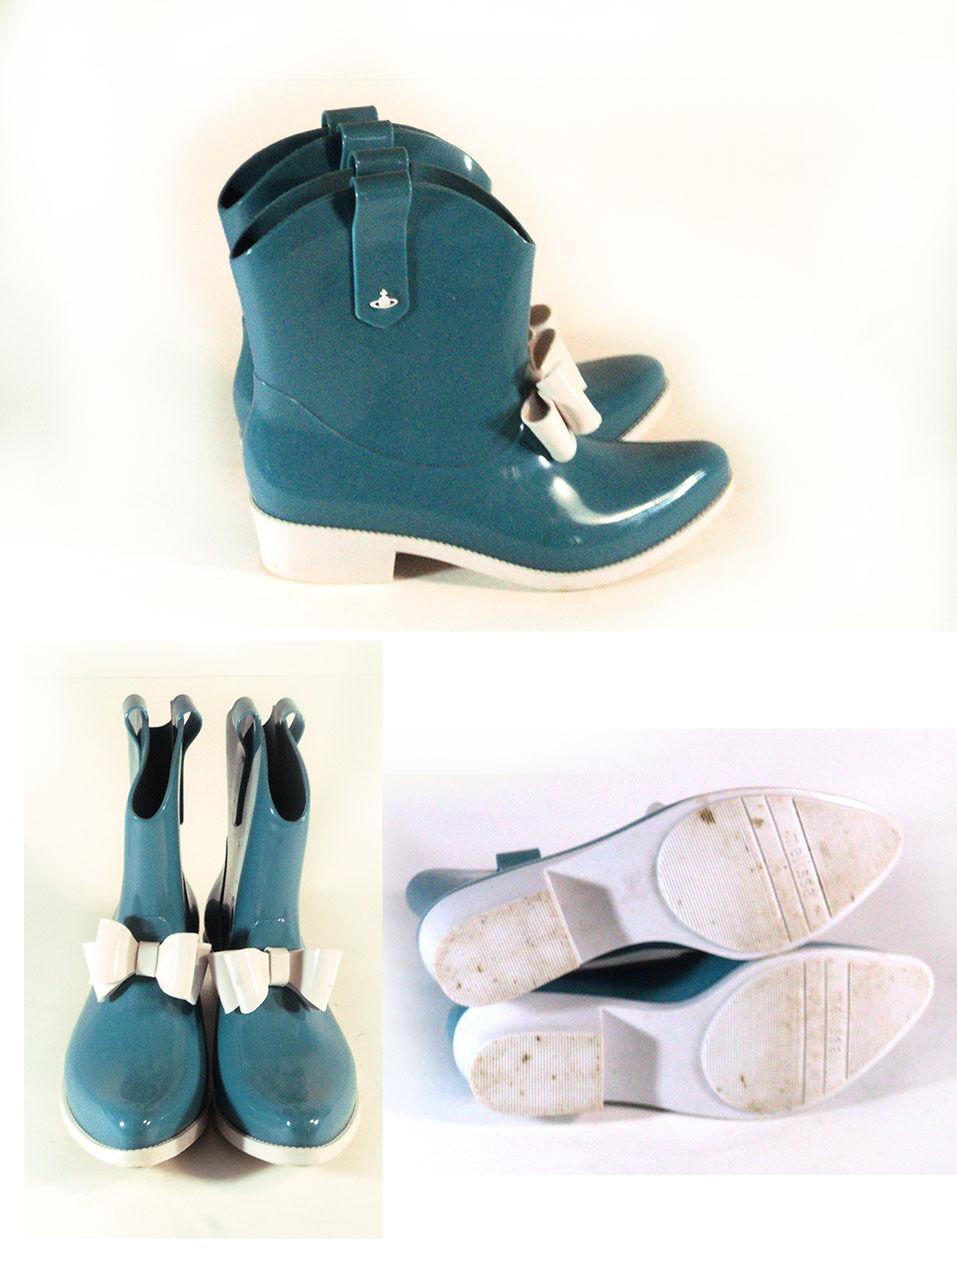 Melissa Shoes Boots Vivienne Westwood Protection Blue Boots Shoes 5/38 4188ee